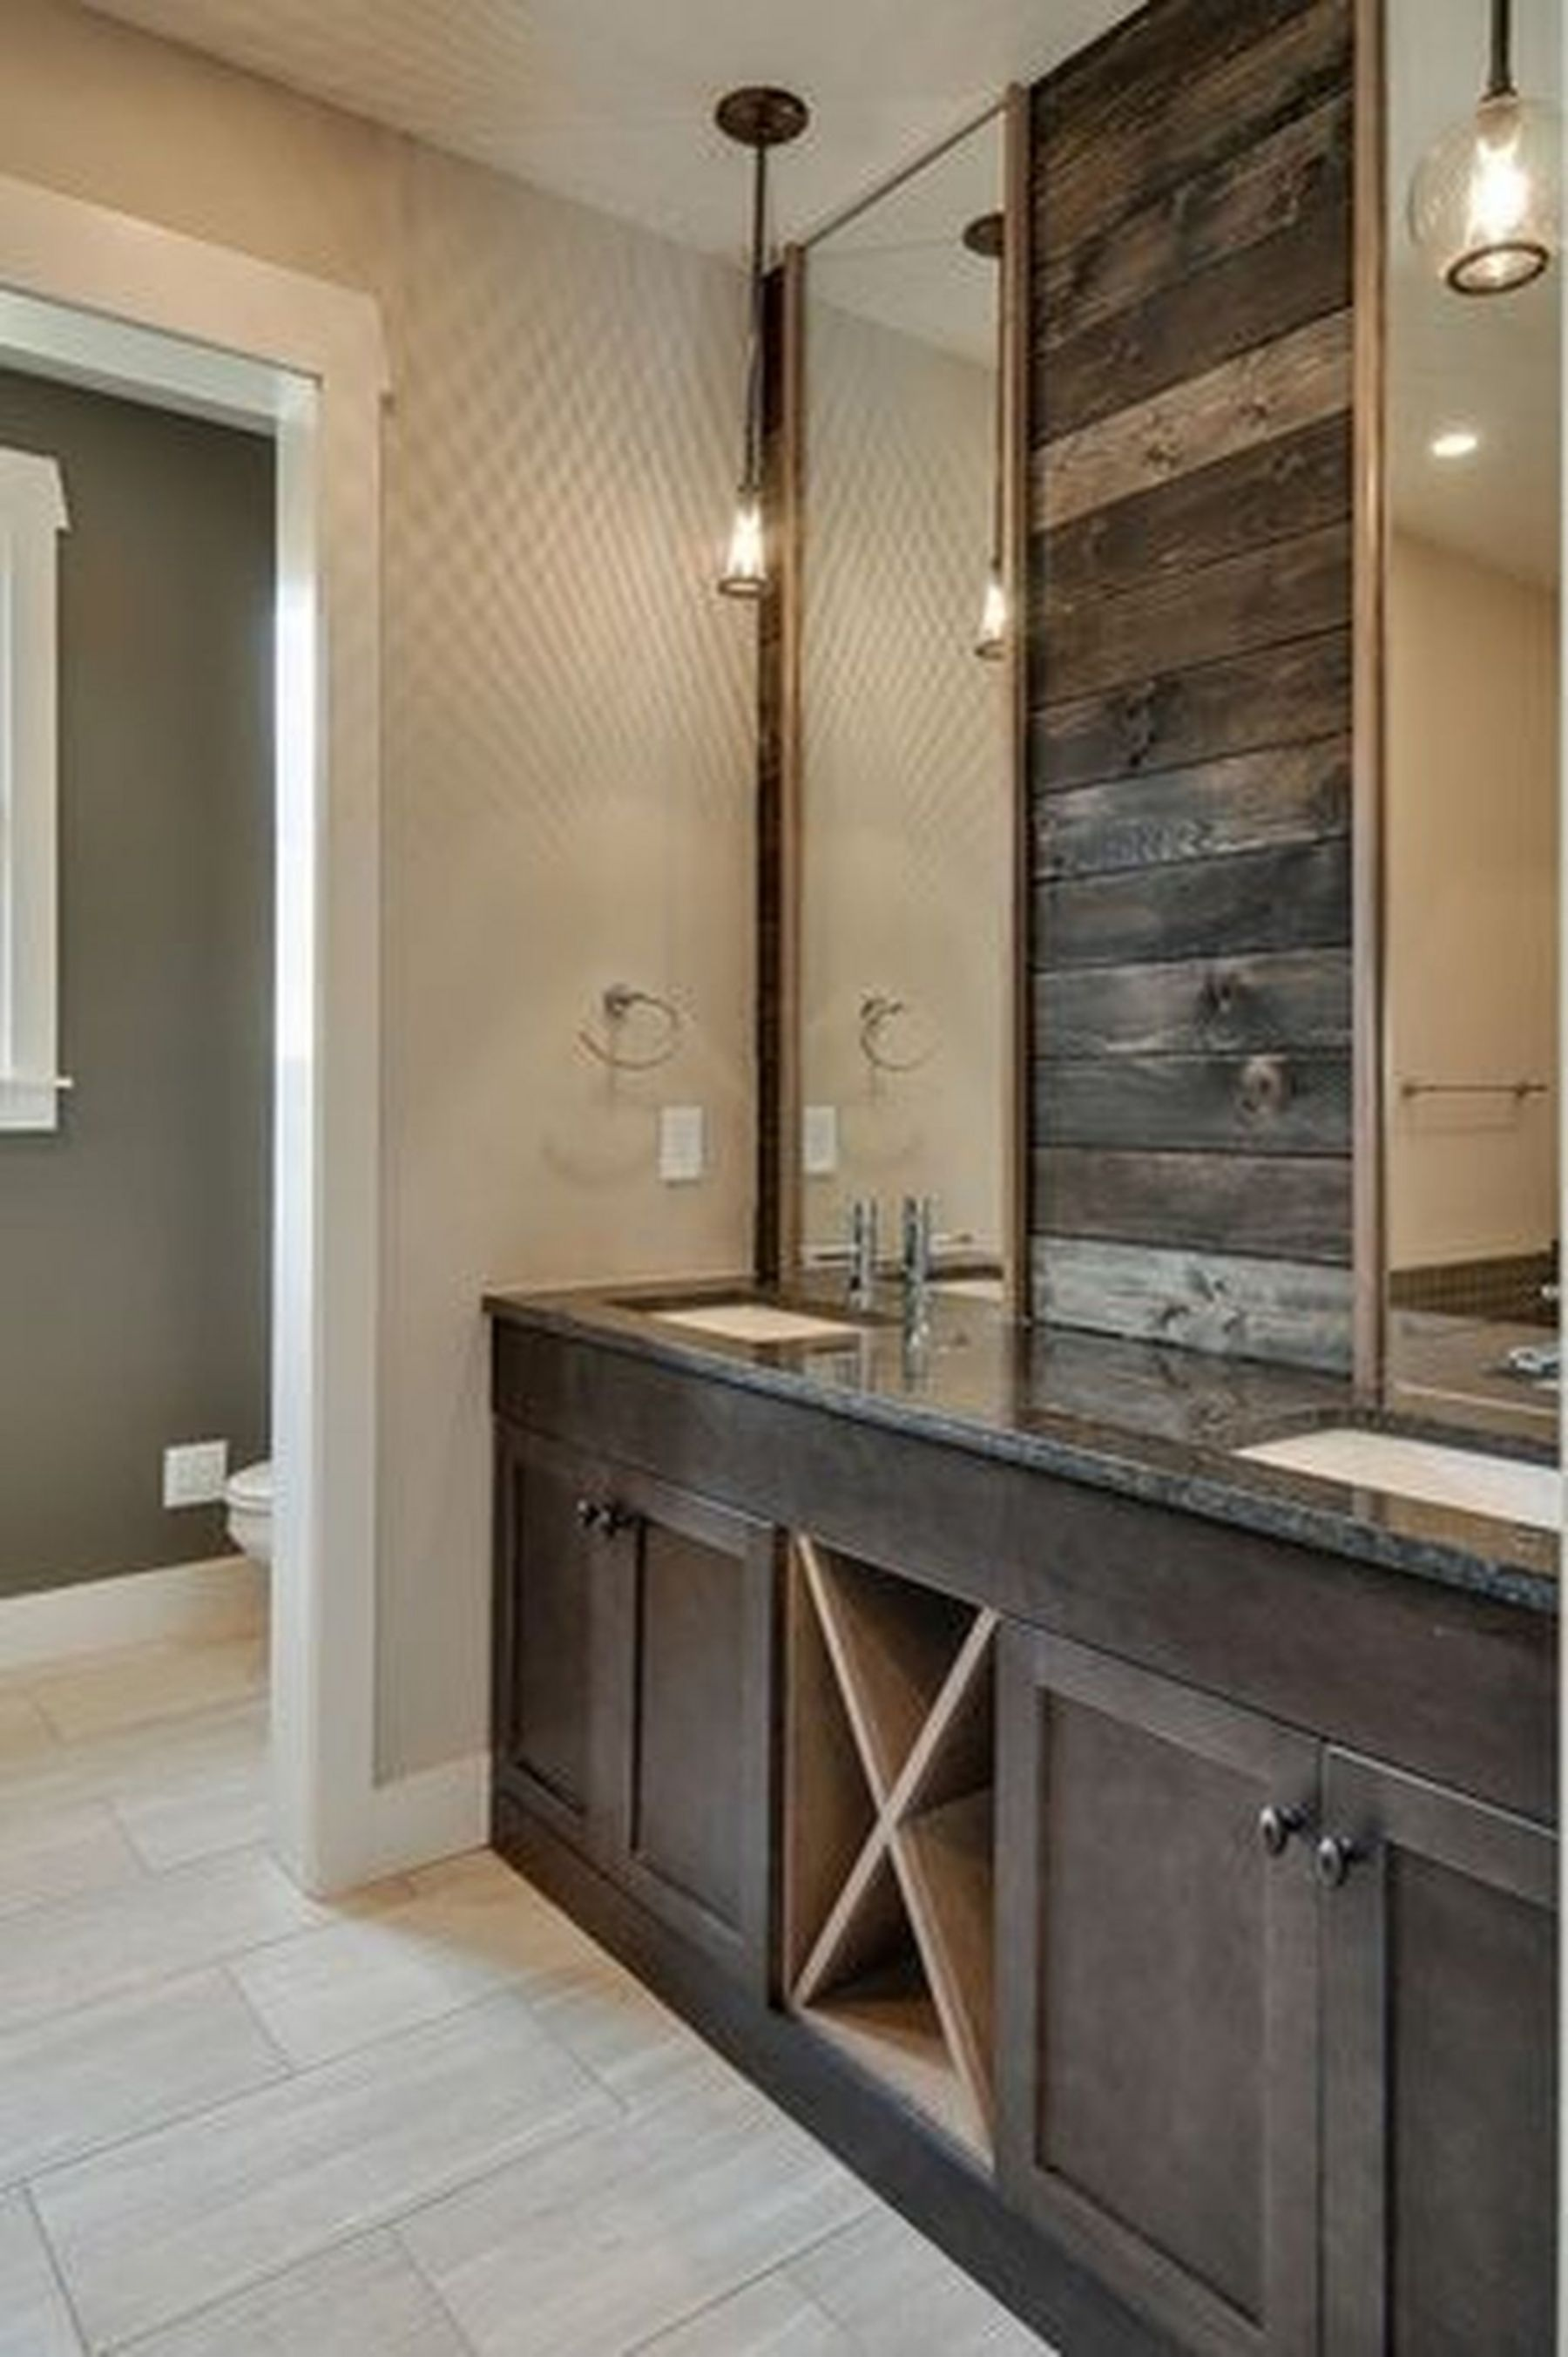 10 Stunning Modern Rustic Bathroom Design Ideas For Your Home #rusticbathroomdesigns